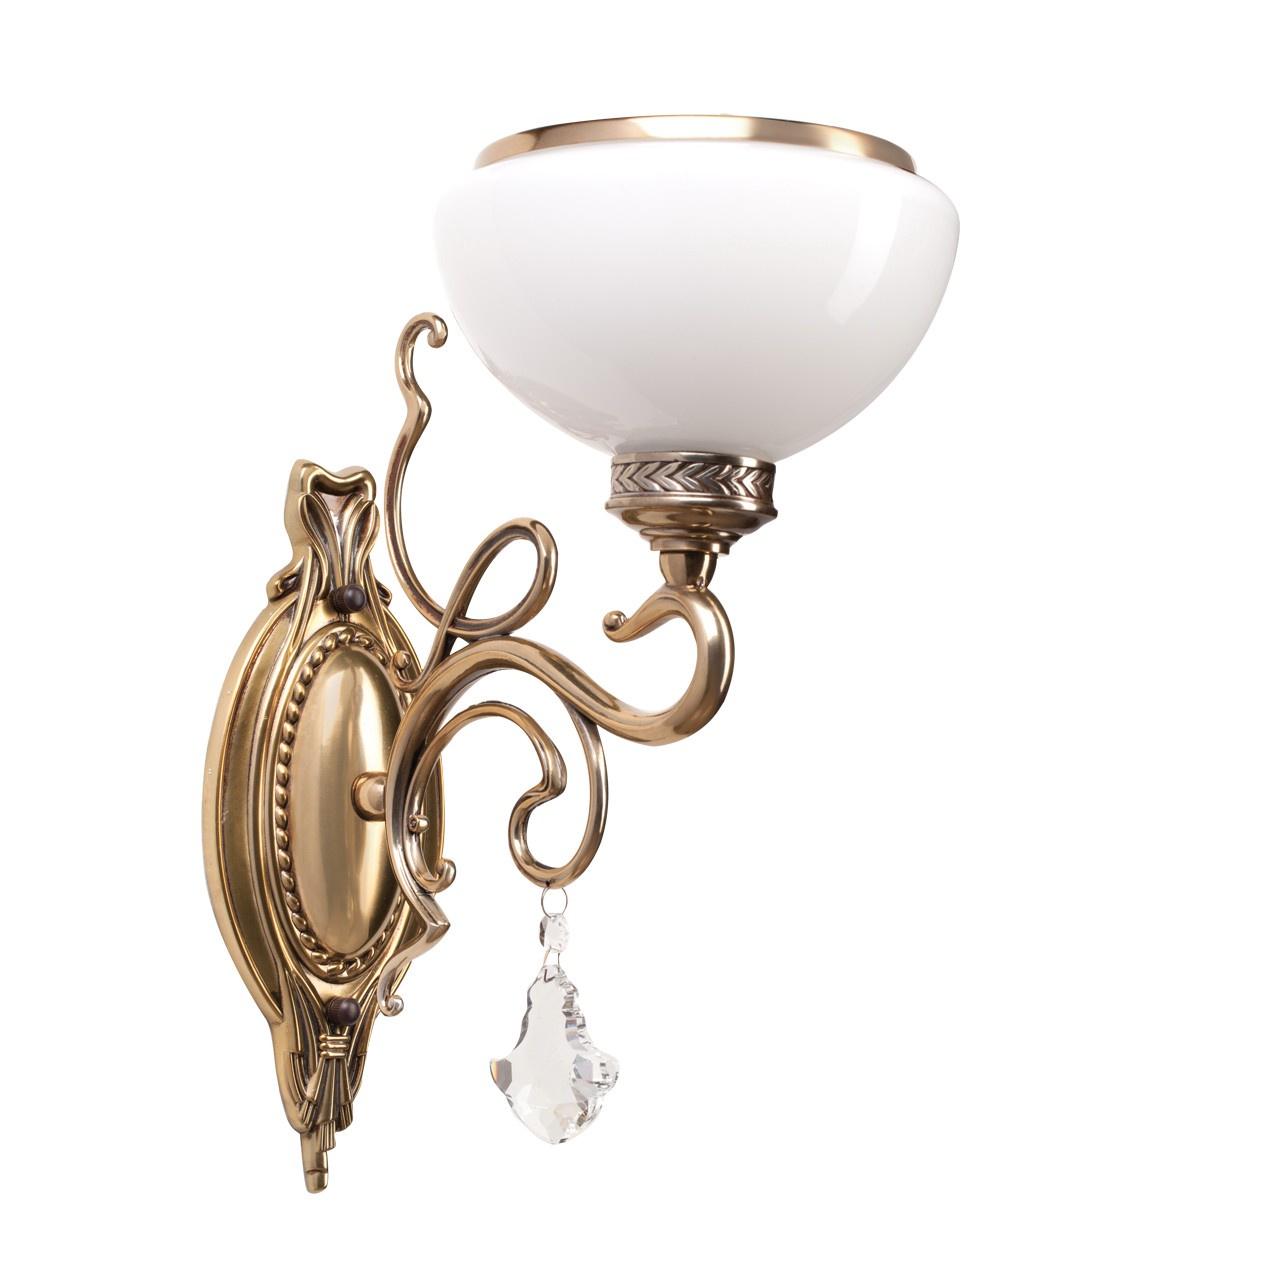 Настенный светильник MW Аманда, 481020401, бронза бра аманда 5 481021401 mw light 1113614 page 4